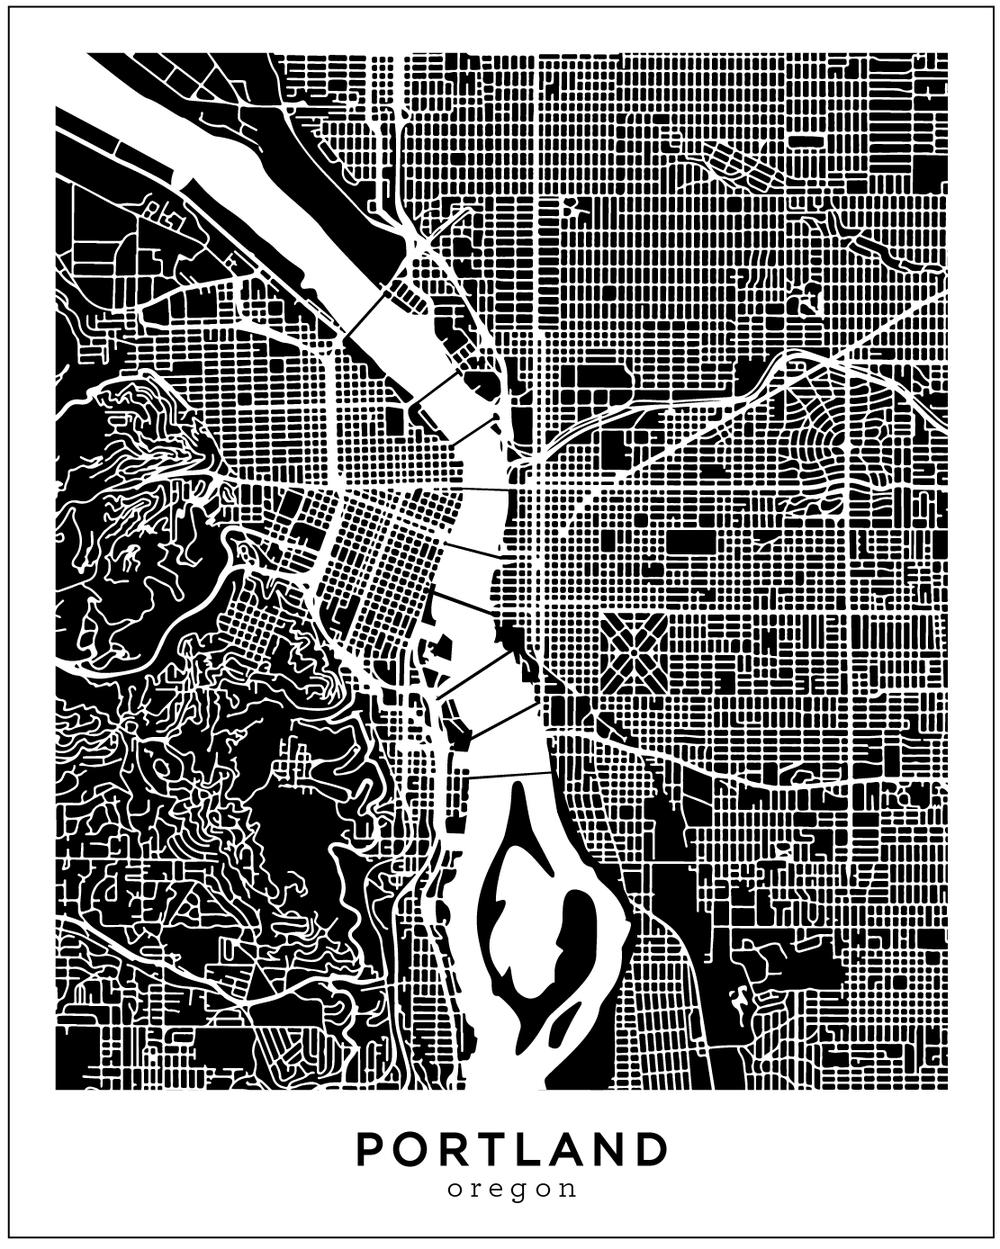 PortlandMap2-01-01.png